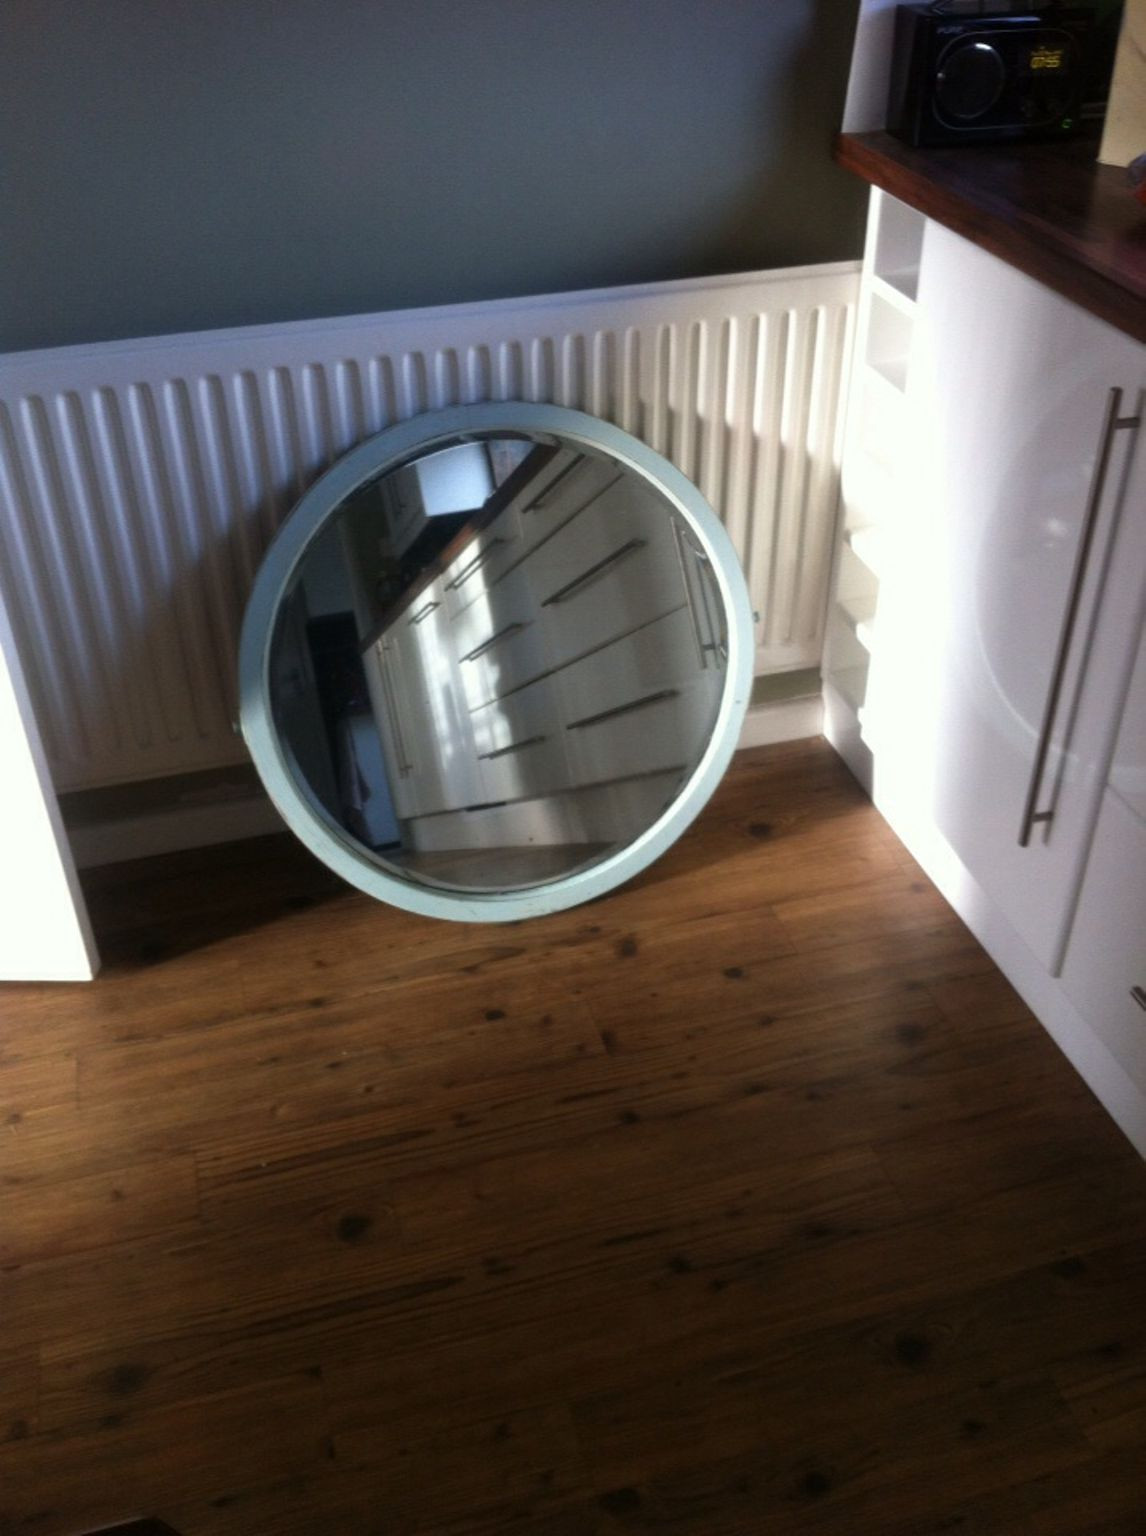 hardwood floor refinishing whitby of https en shpock com i wlfqgxc7ygpti0wd 2017 07 11t092633 02 in large round vintage mirror